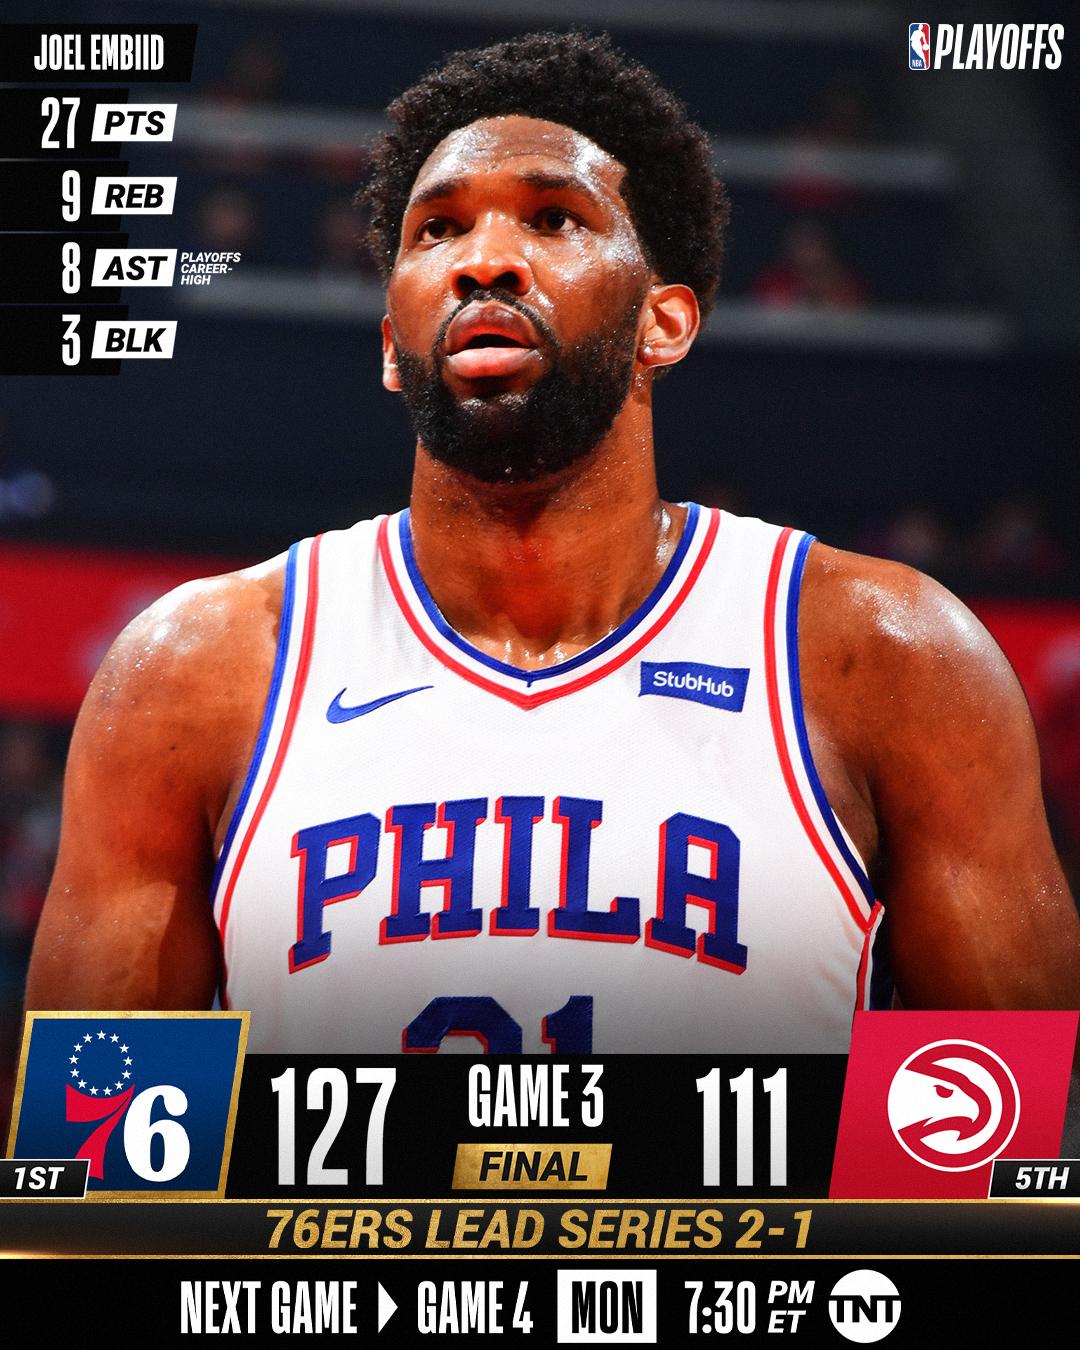 12-6-3